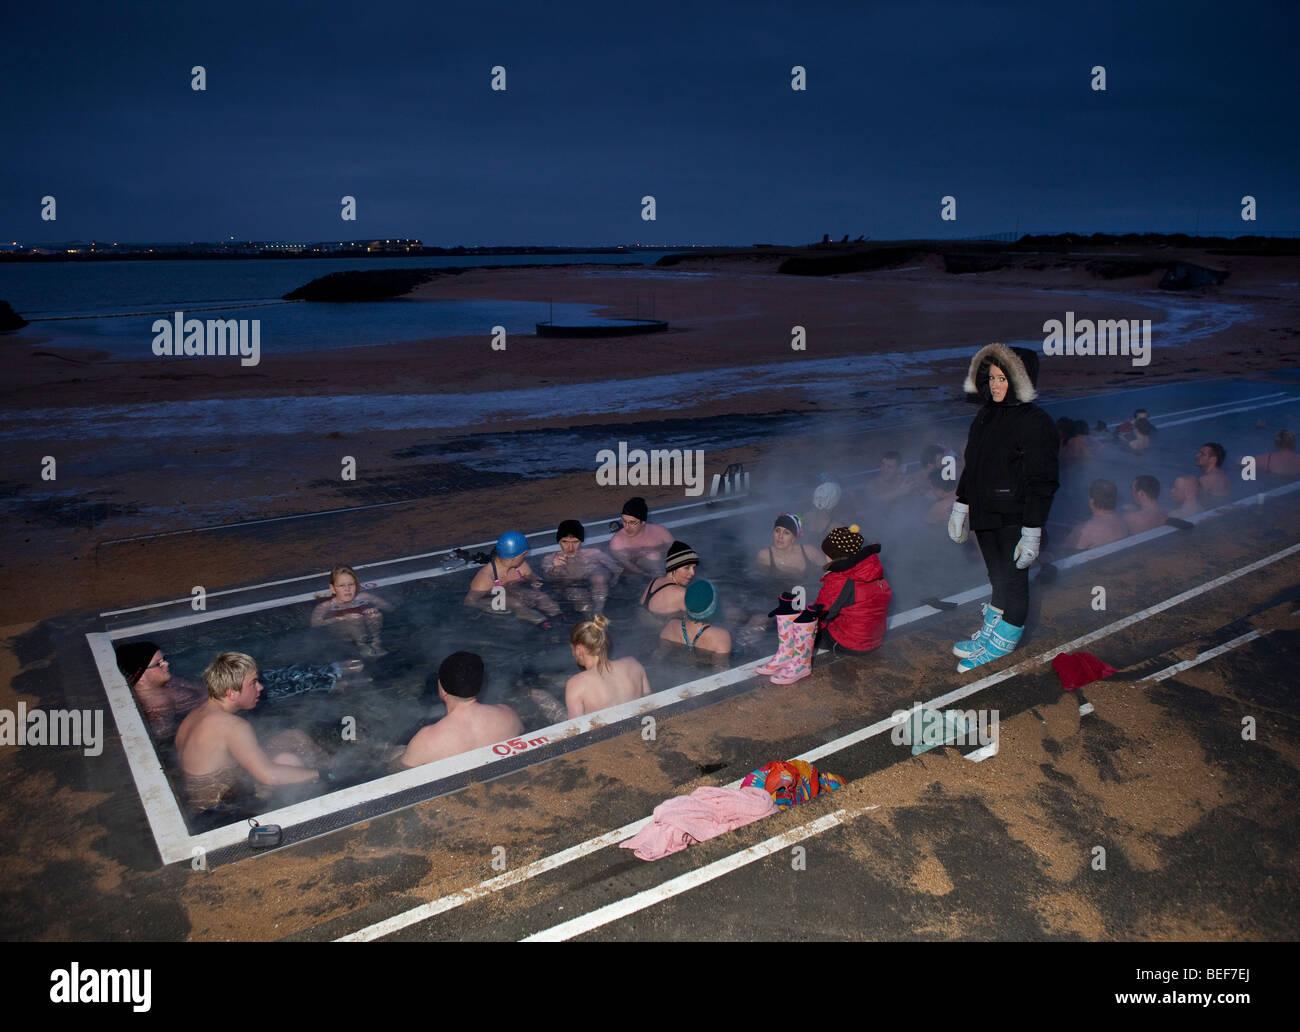 Group in Geothermal heated hot tub, winter evening, Reykjavik ...